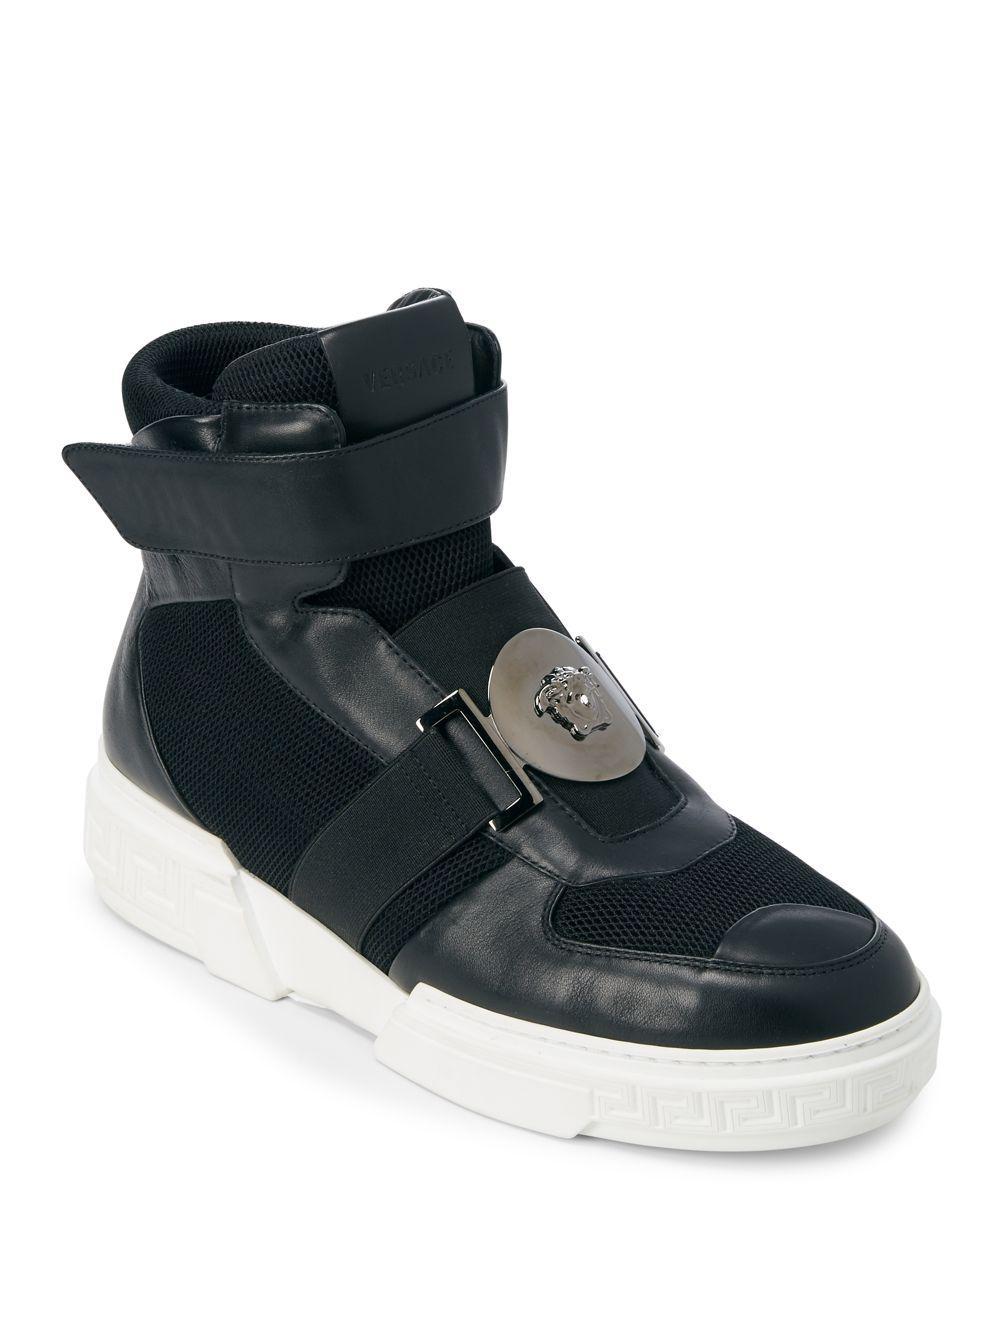 Black Croc Medusa Sock High-Top Sneakers Versace 1vZB3B5